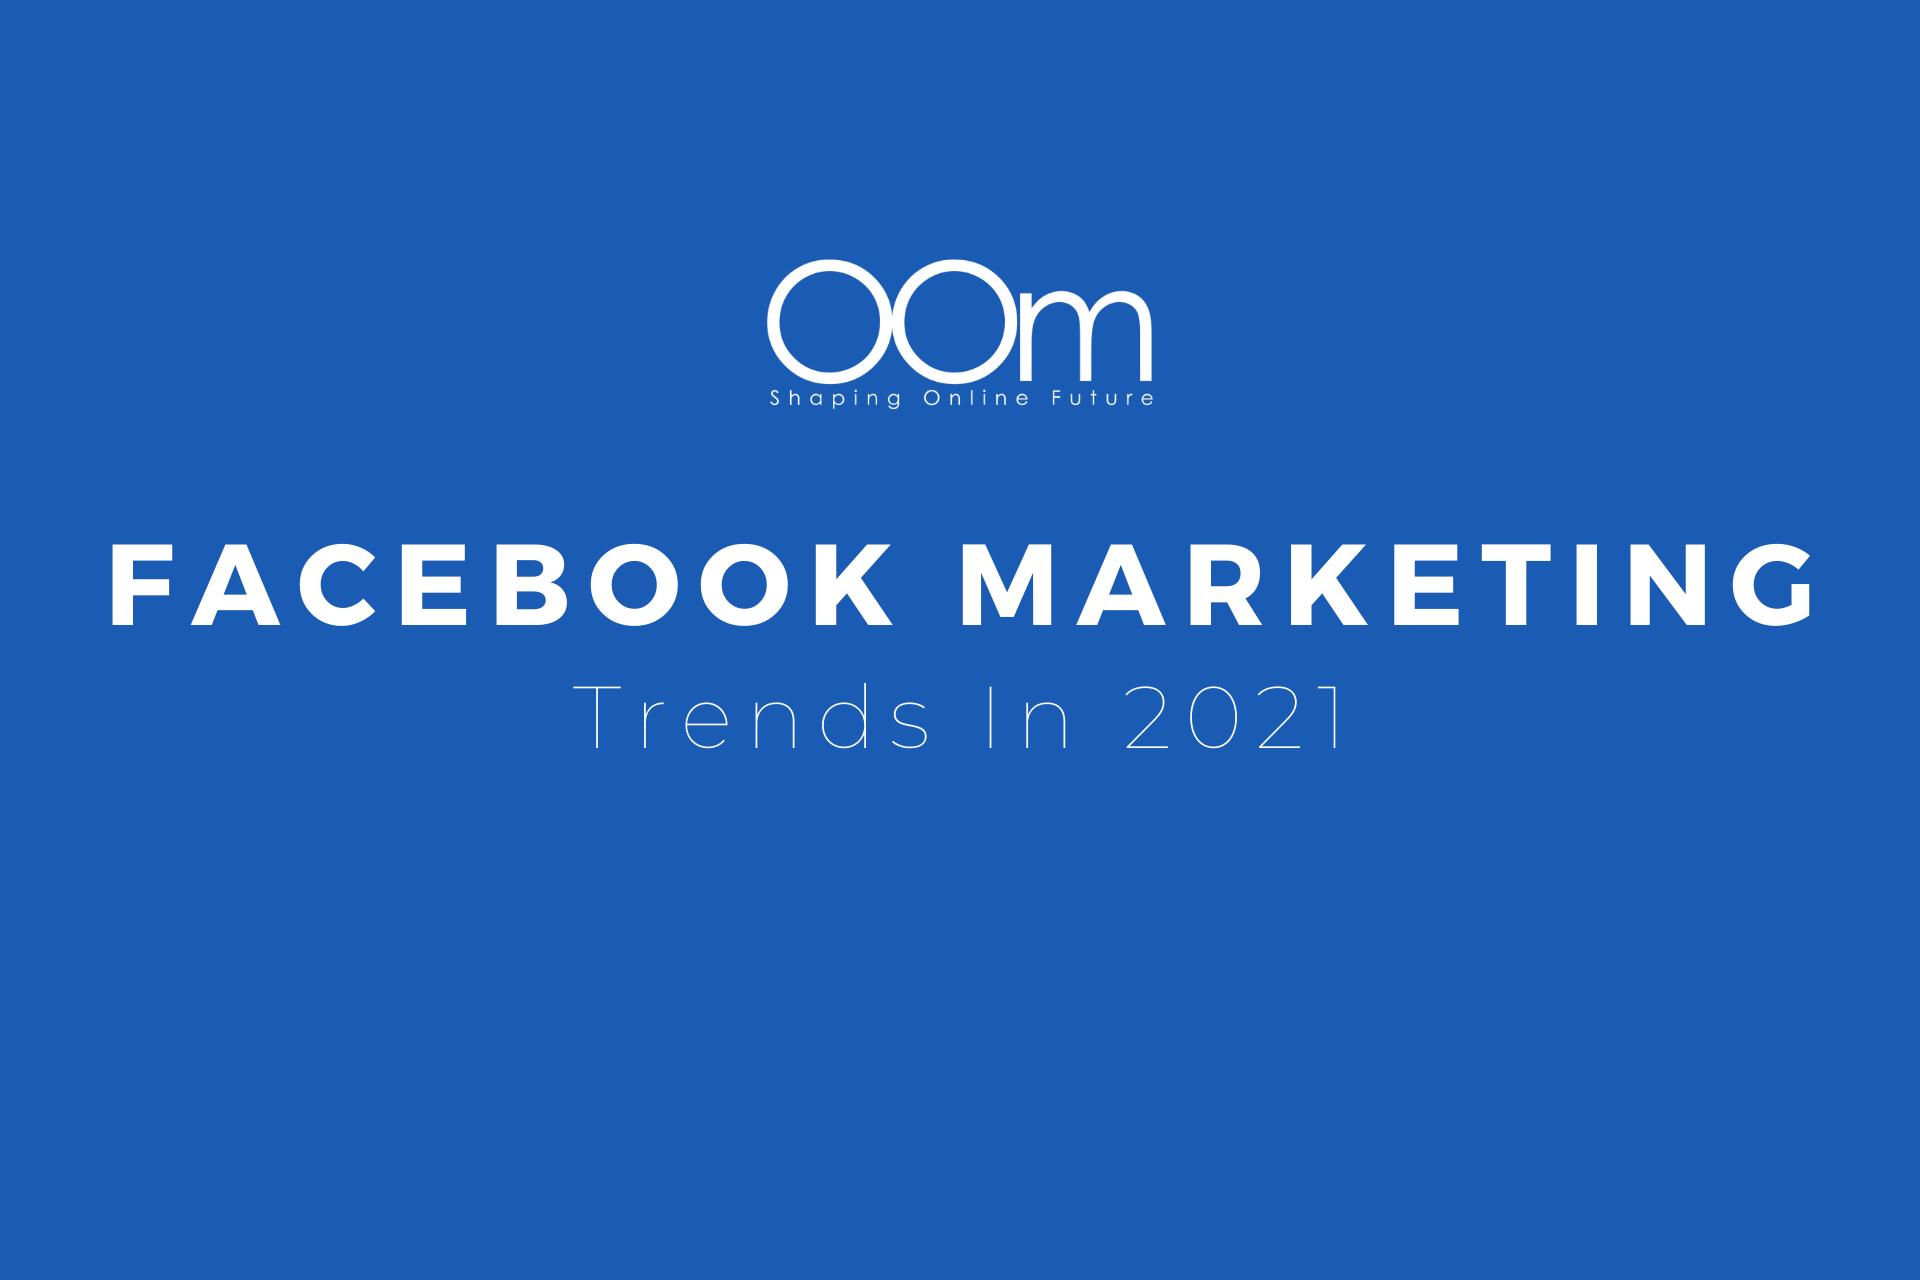 Facebook Marketing Trends In 2021